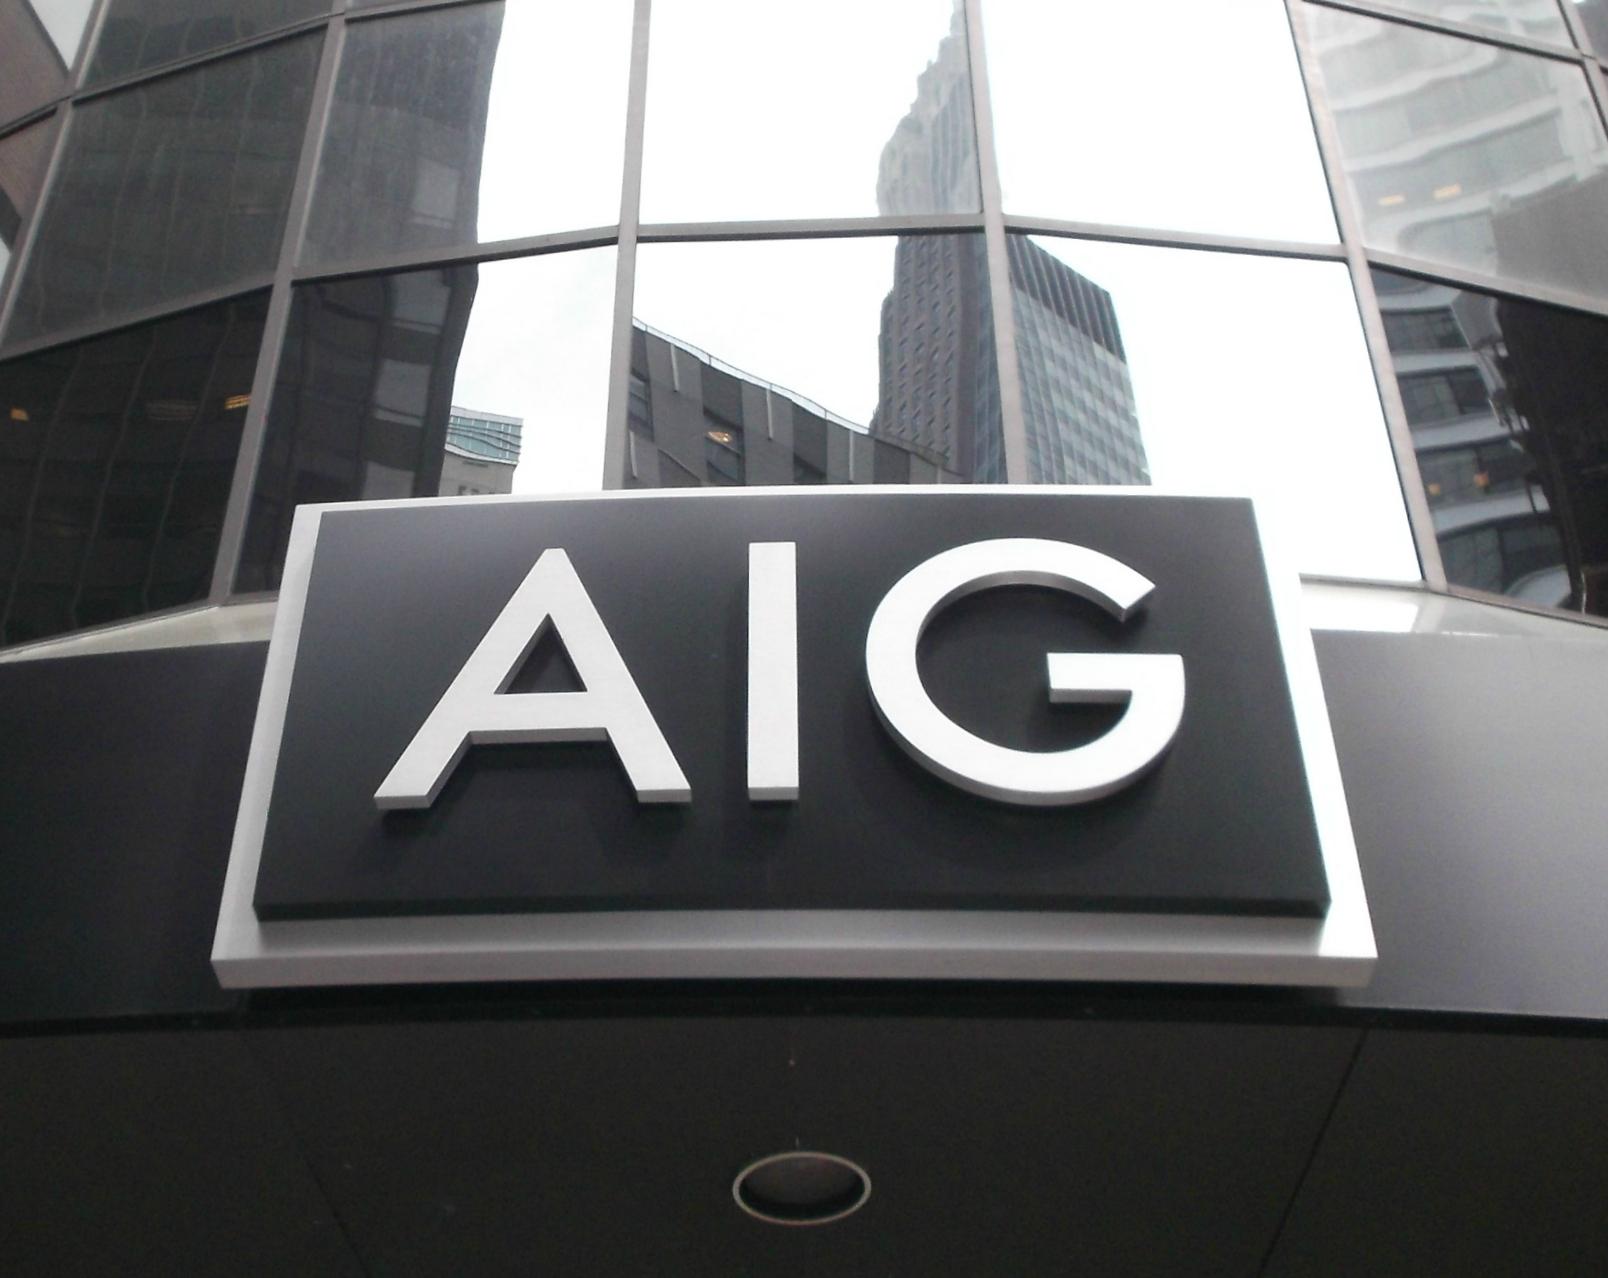 UBS Analysis: Poor Morale Could Hurt AIG Turnaround, Hiring